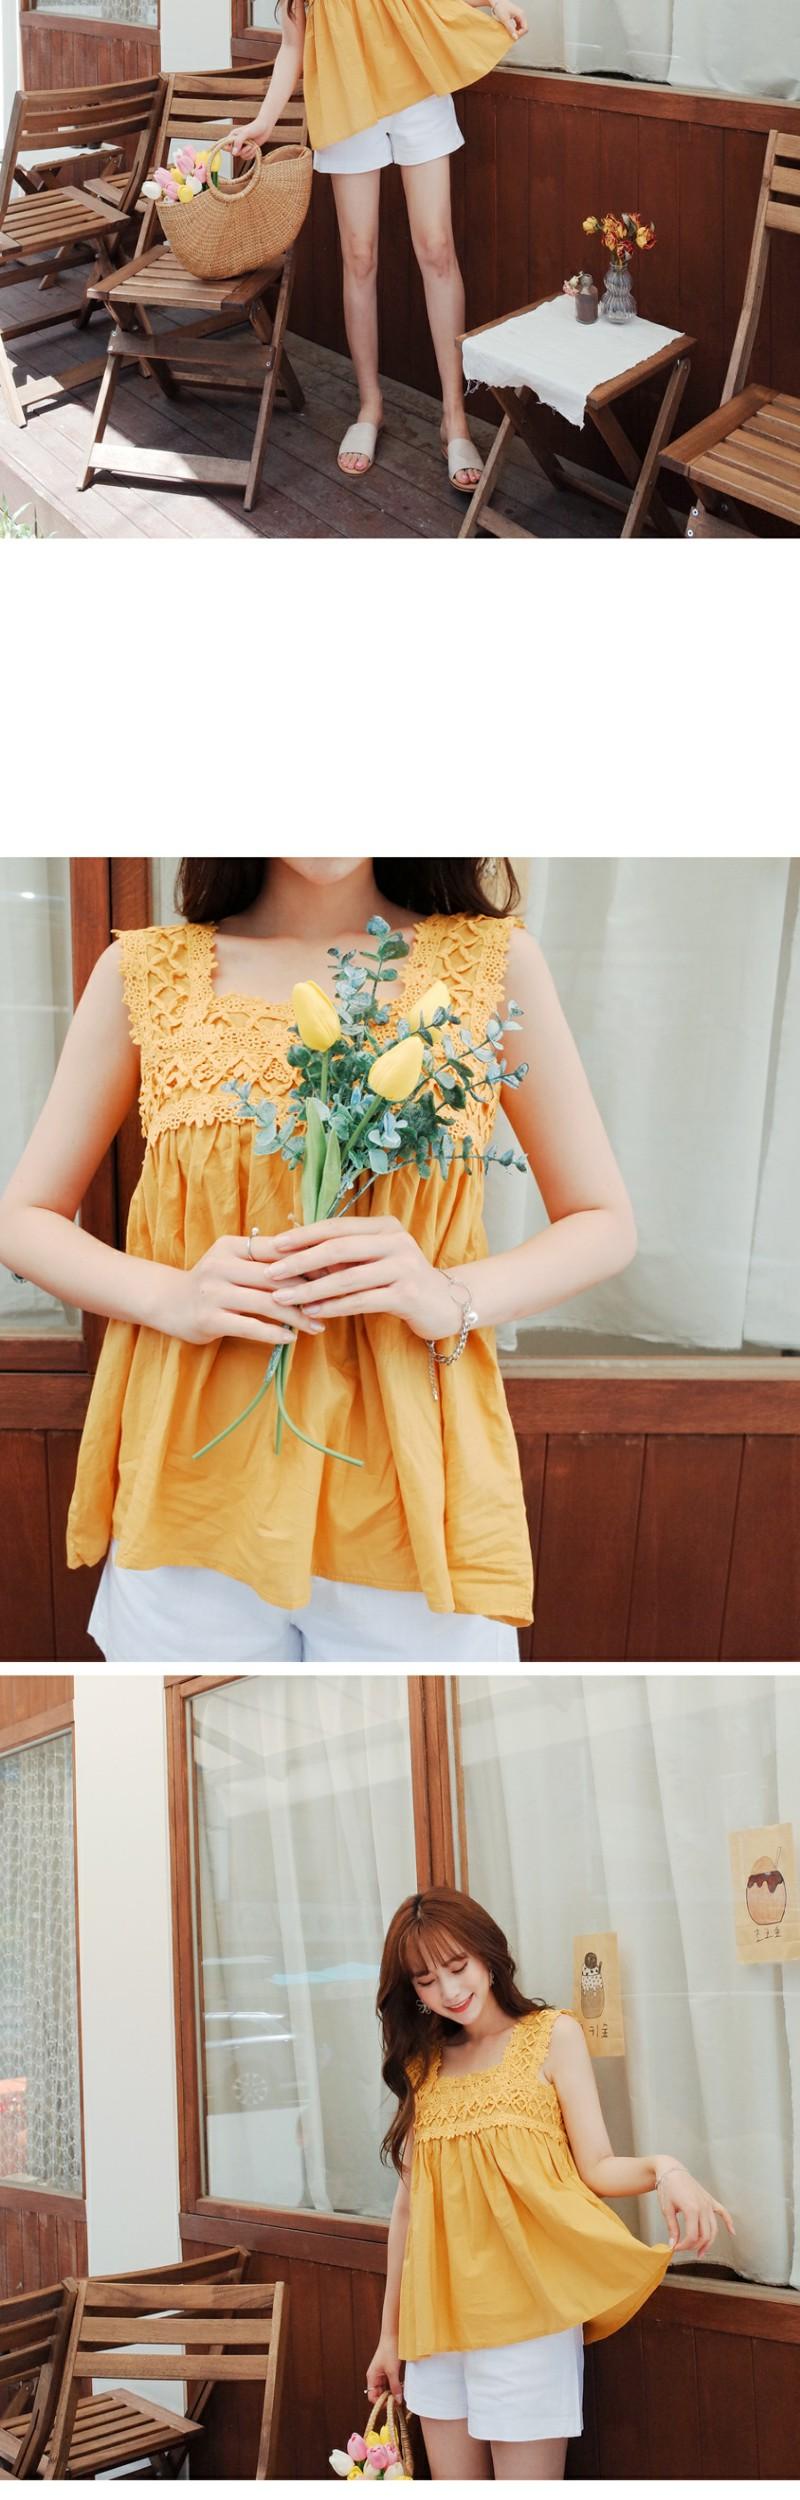 Embroidery Sleeveless Blouse